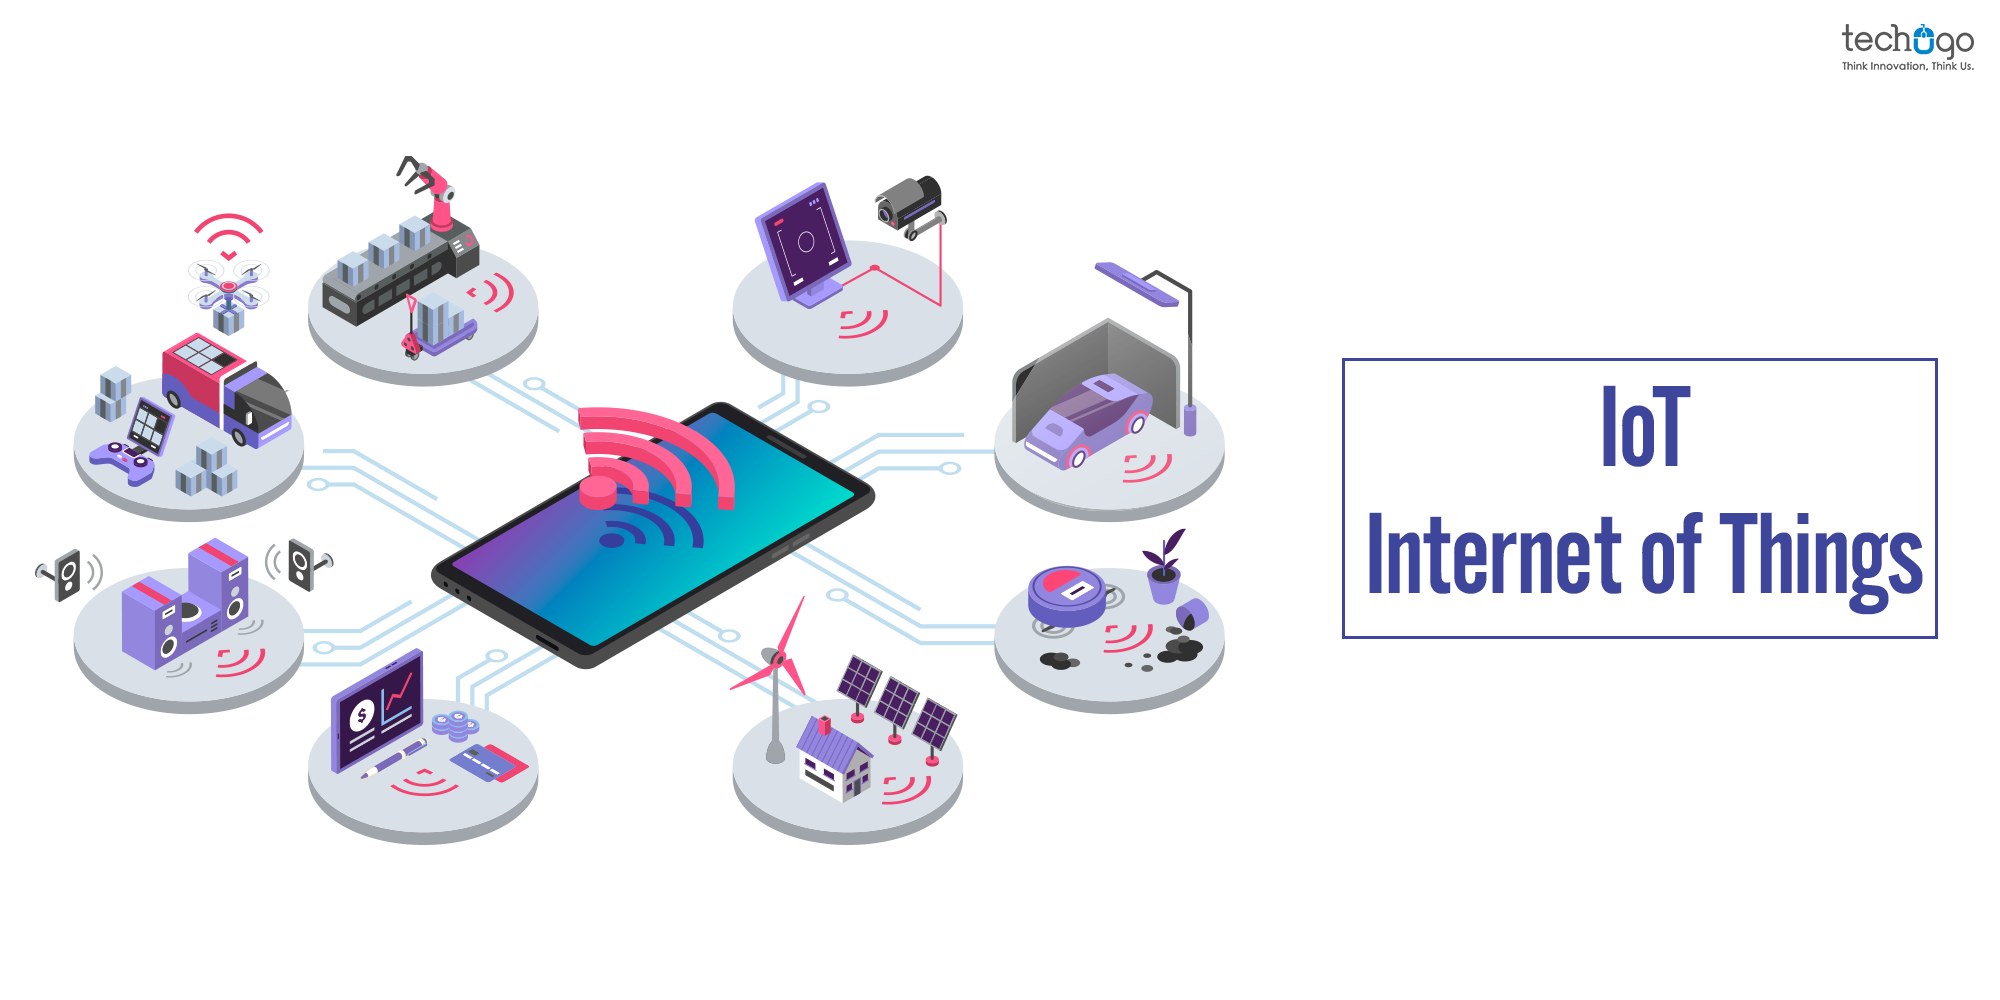 IoT-Internet of Things